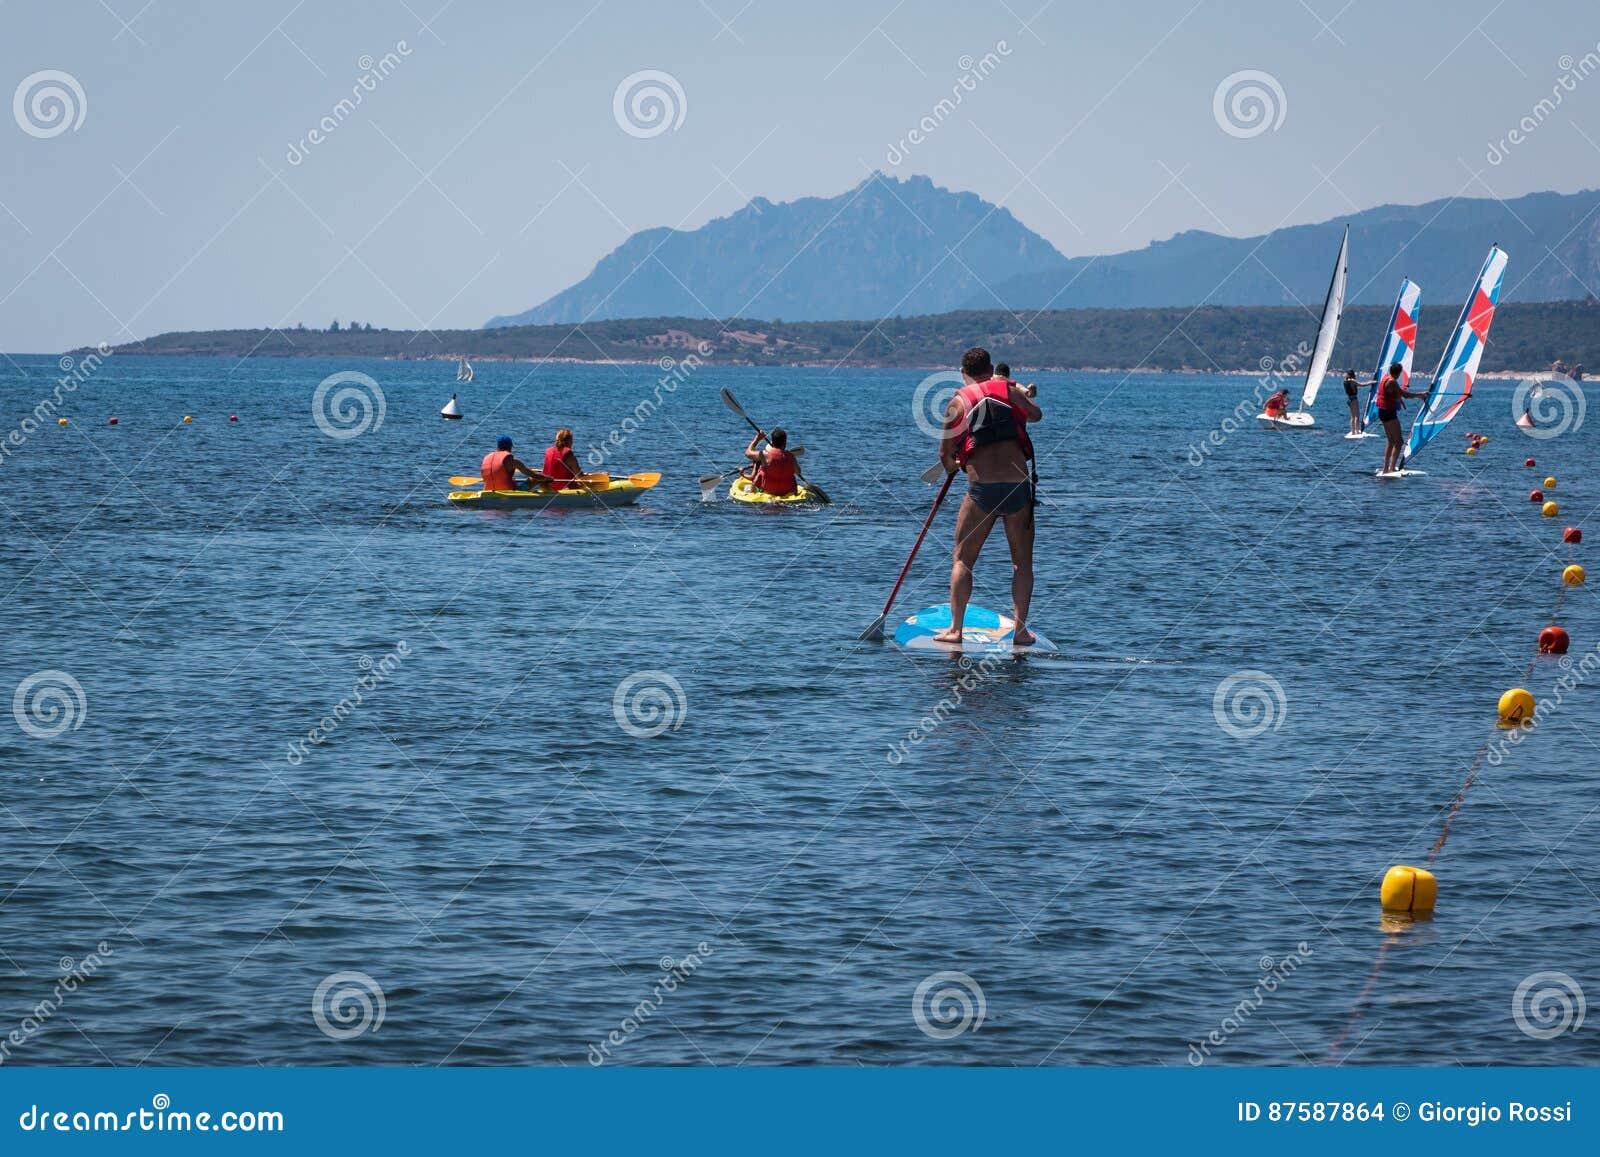 Stå upp surfaremannen Paddleboarding ombord bland kanoter och seger